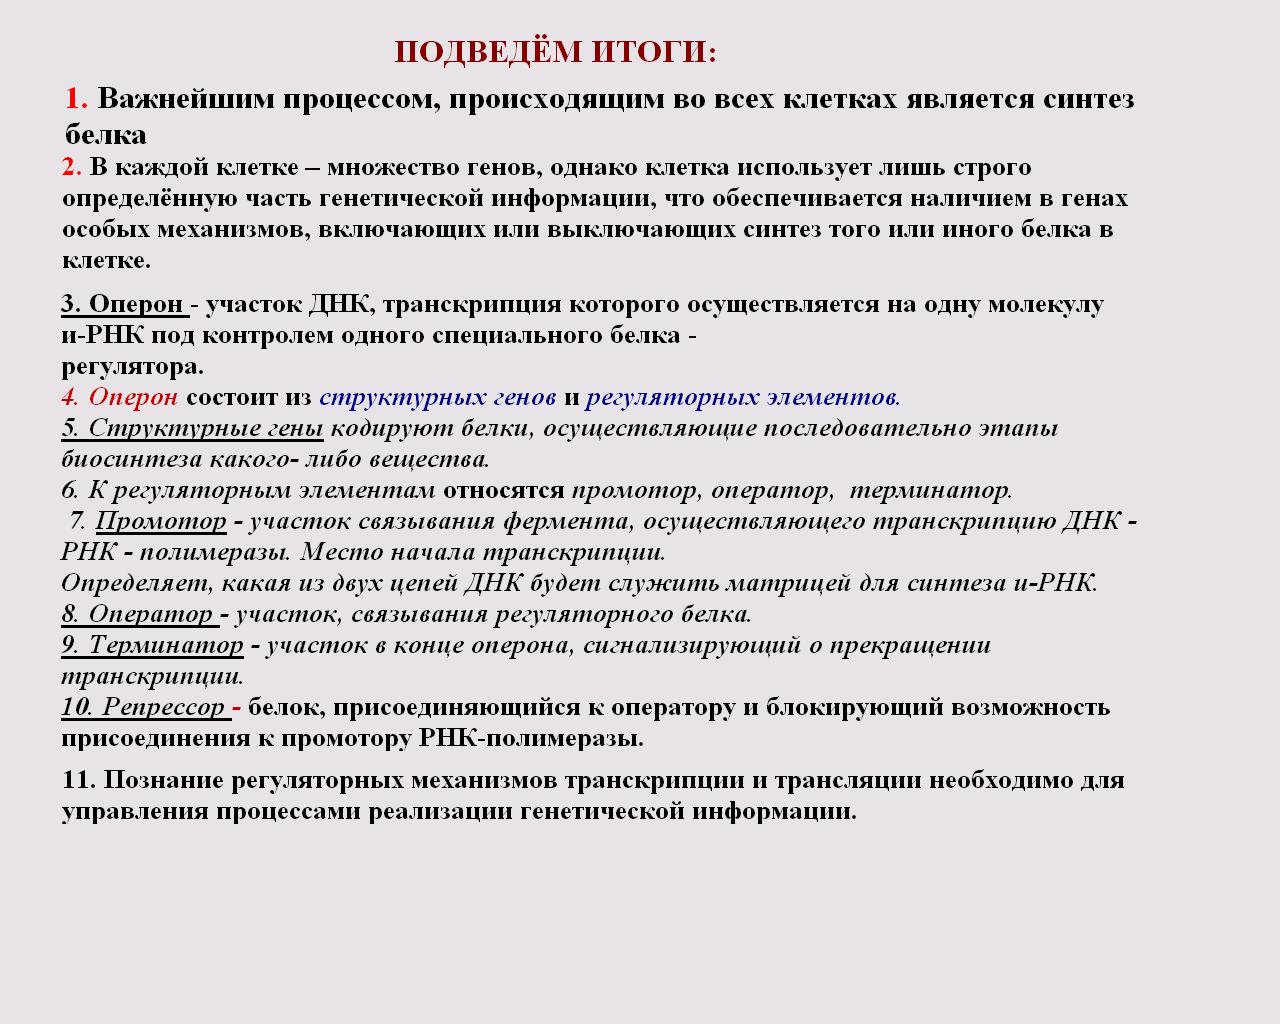 C:\Documents and Settings\test\Рабочий стол\щ.bmp